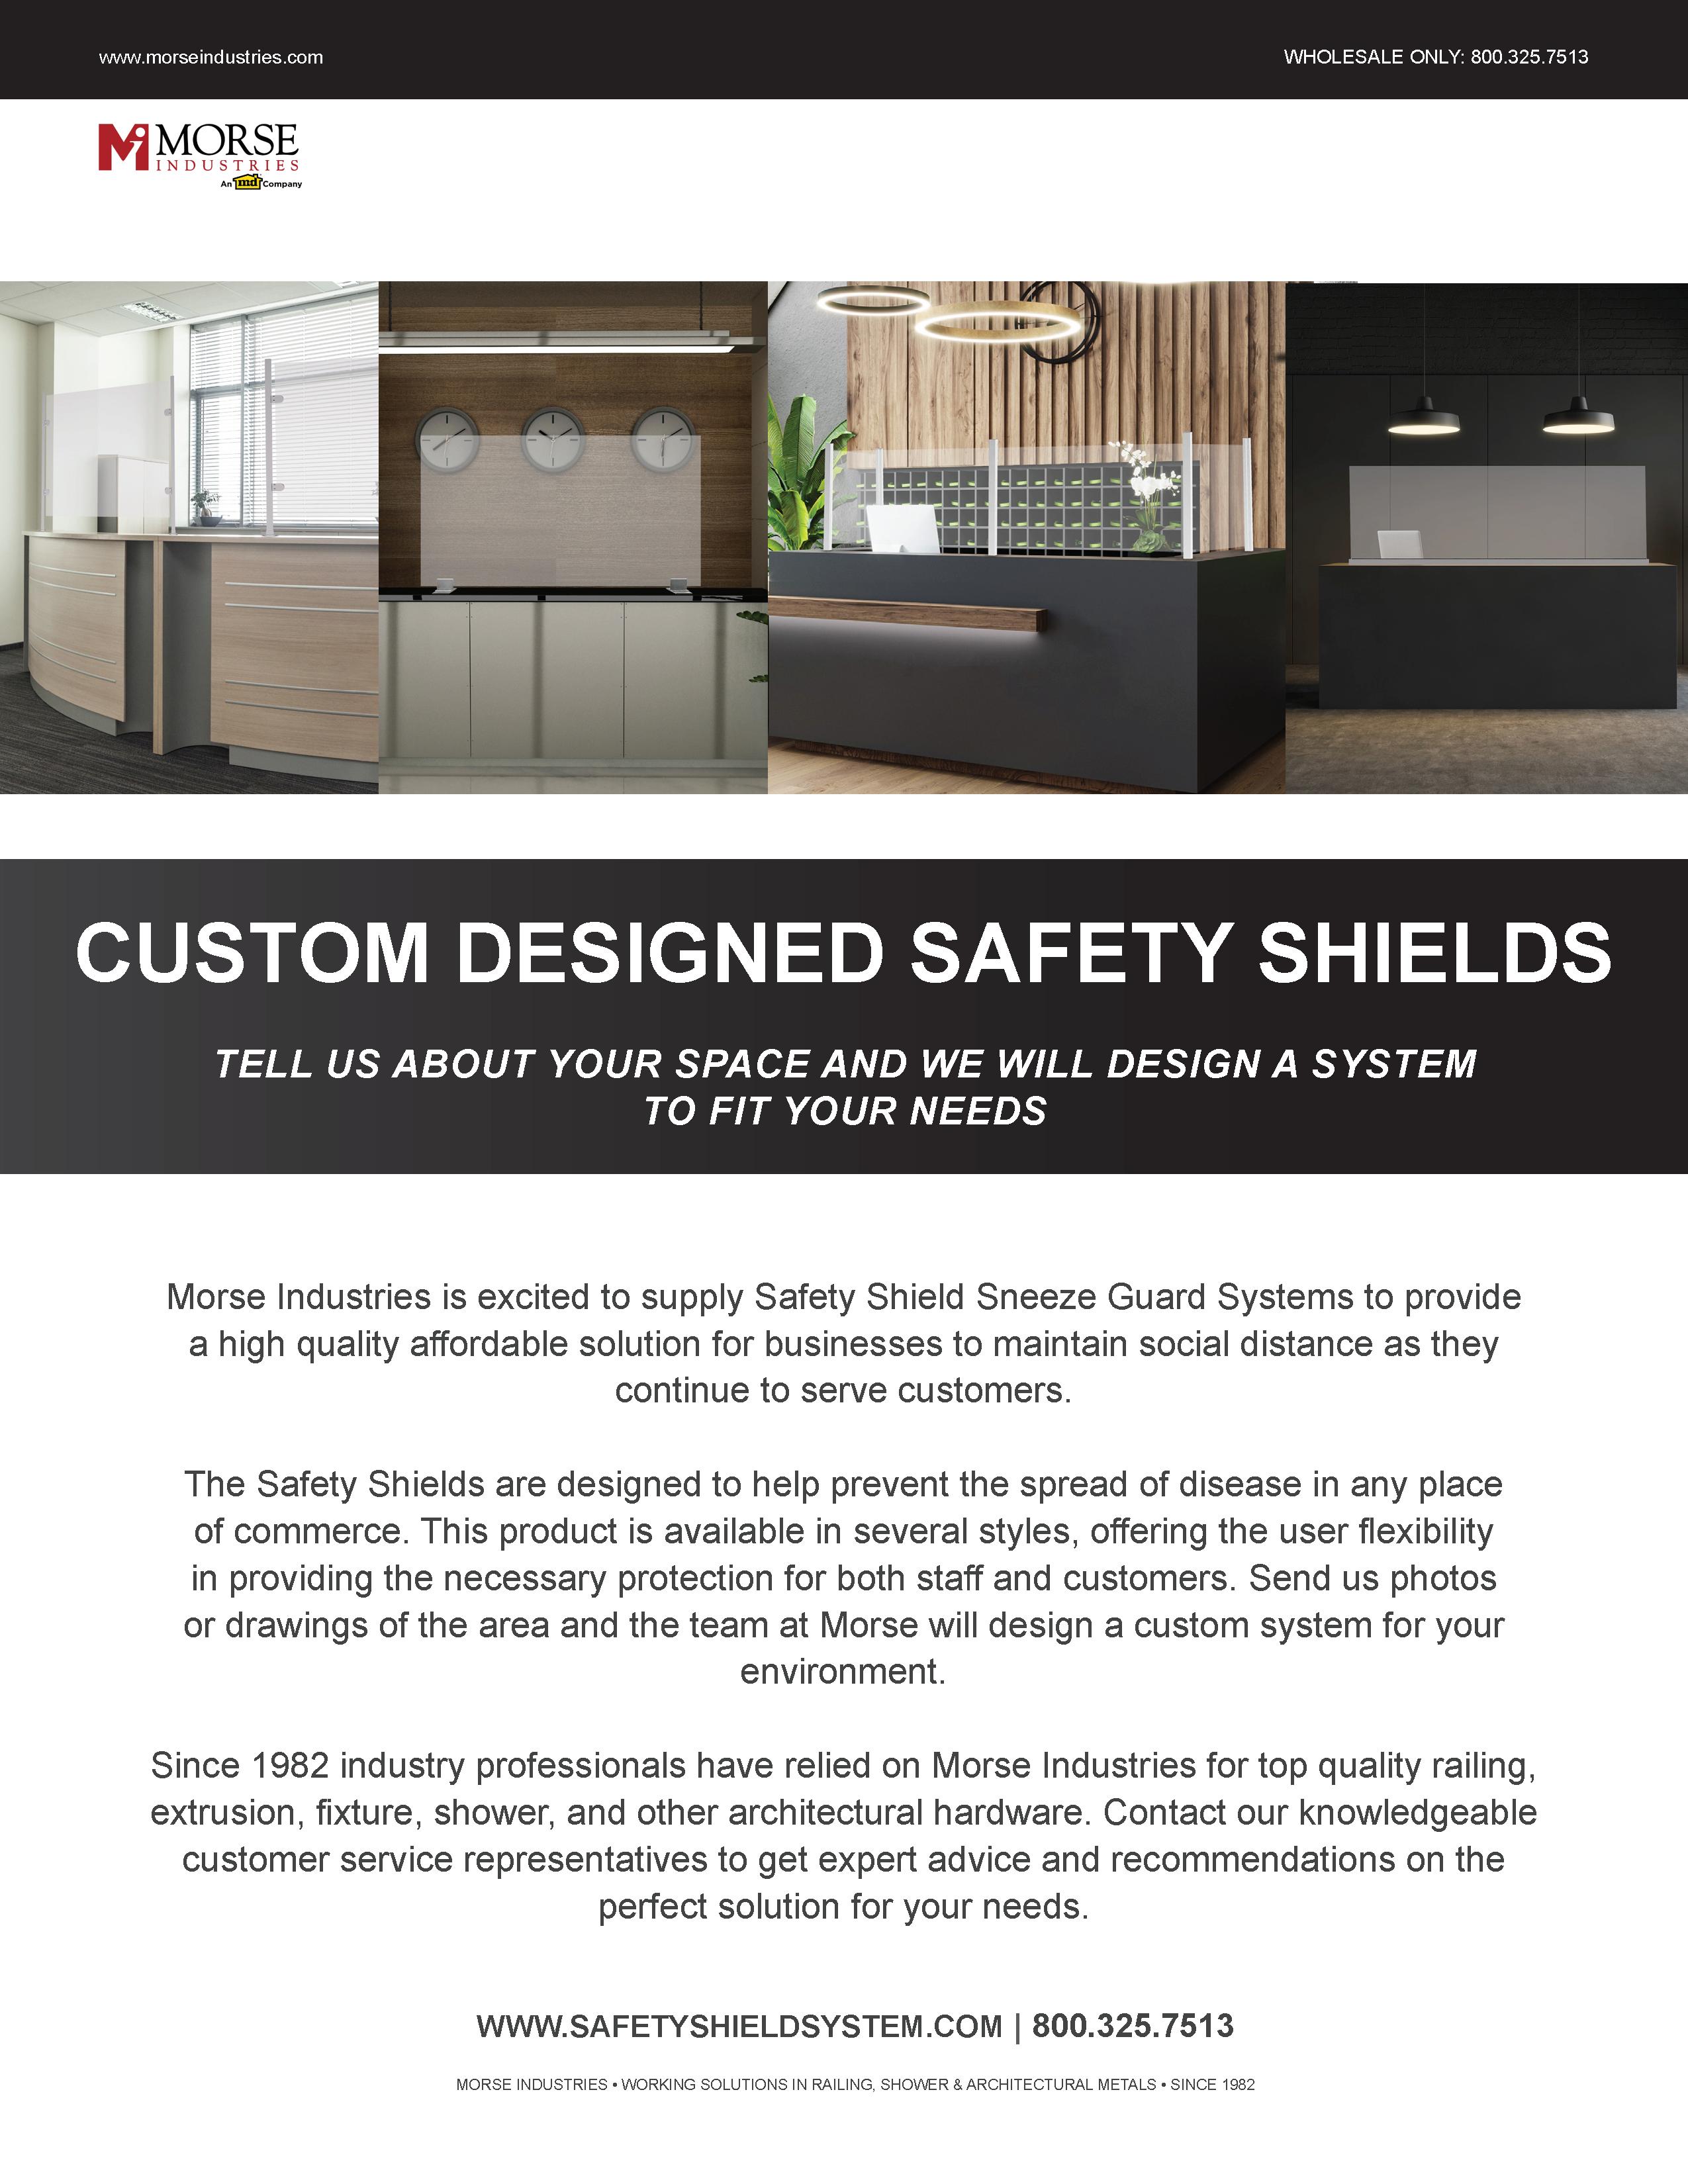 Safety Shield Design Guide